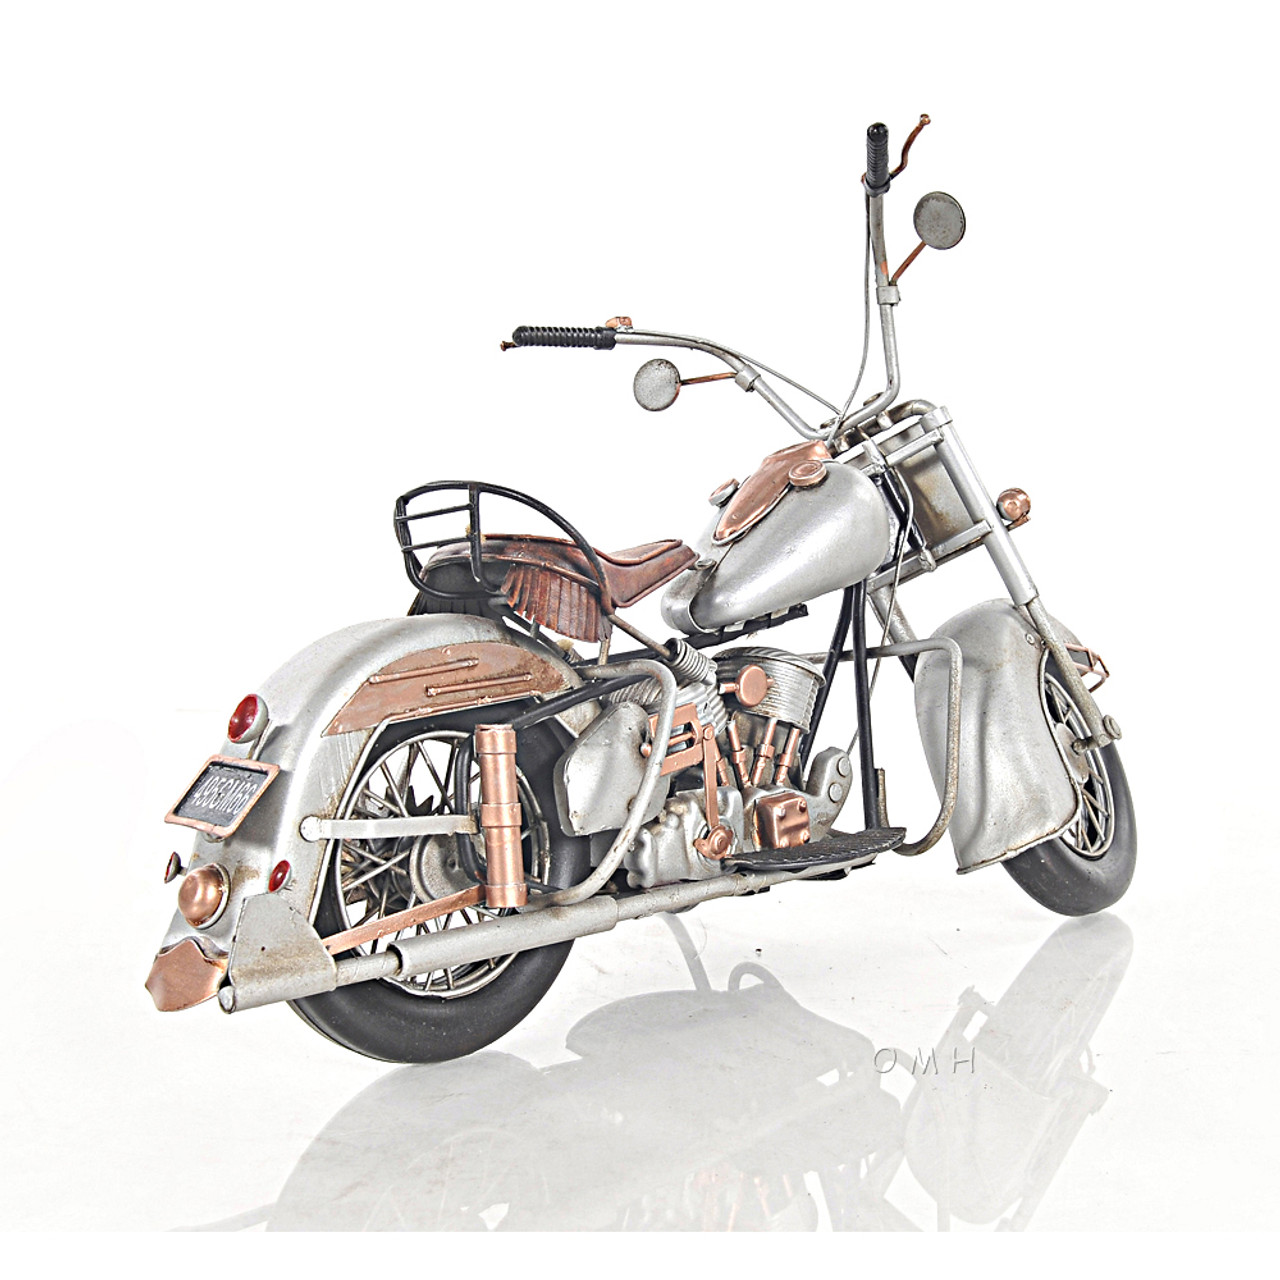 1957 Harley Davidson Sportster Motorcycle Scale Model